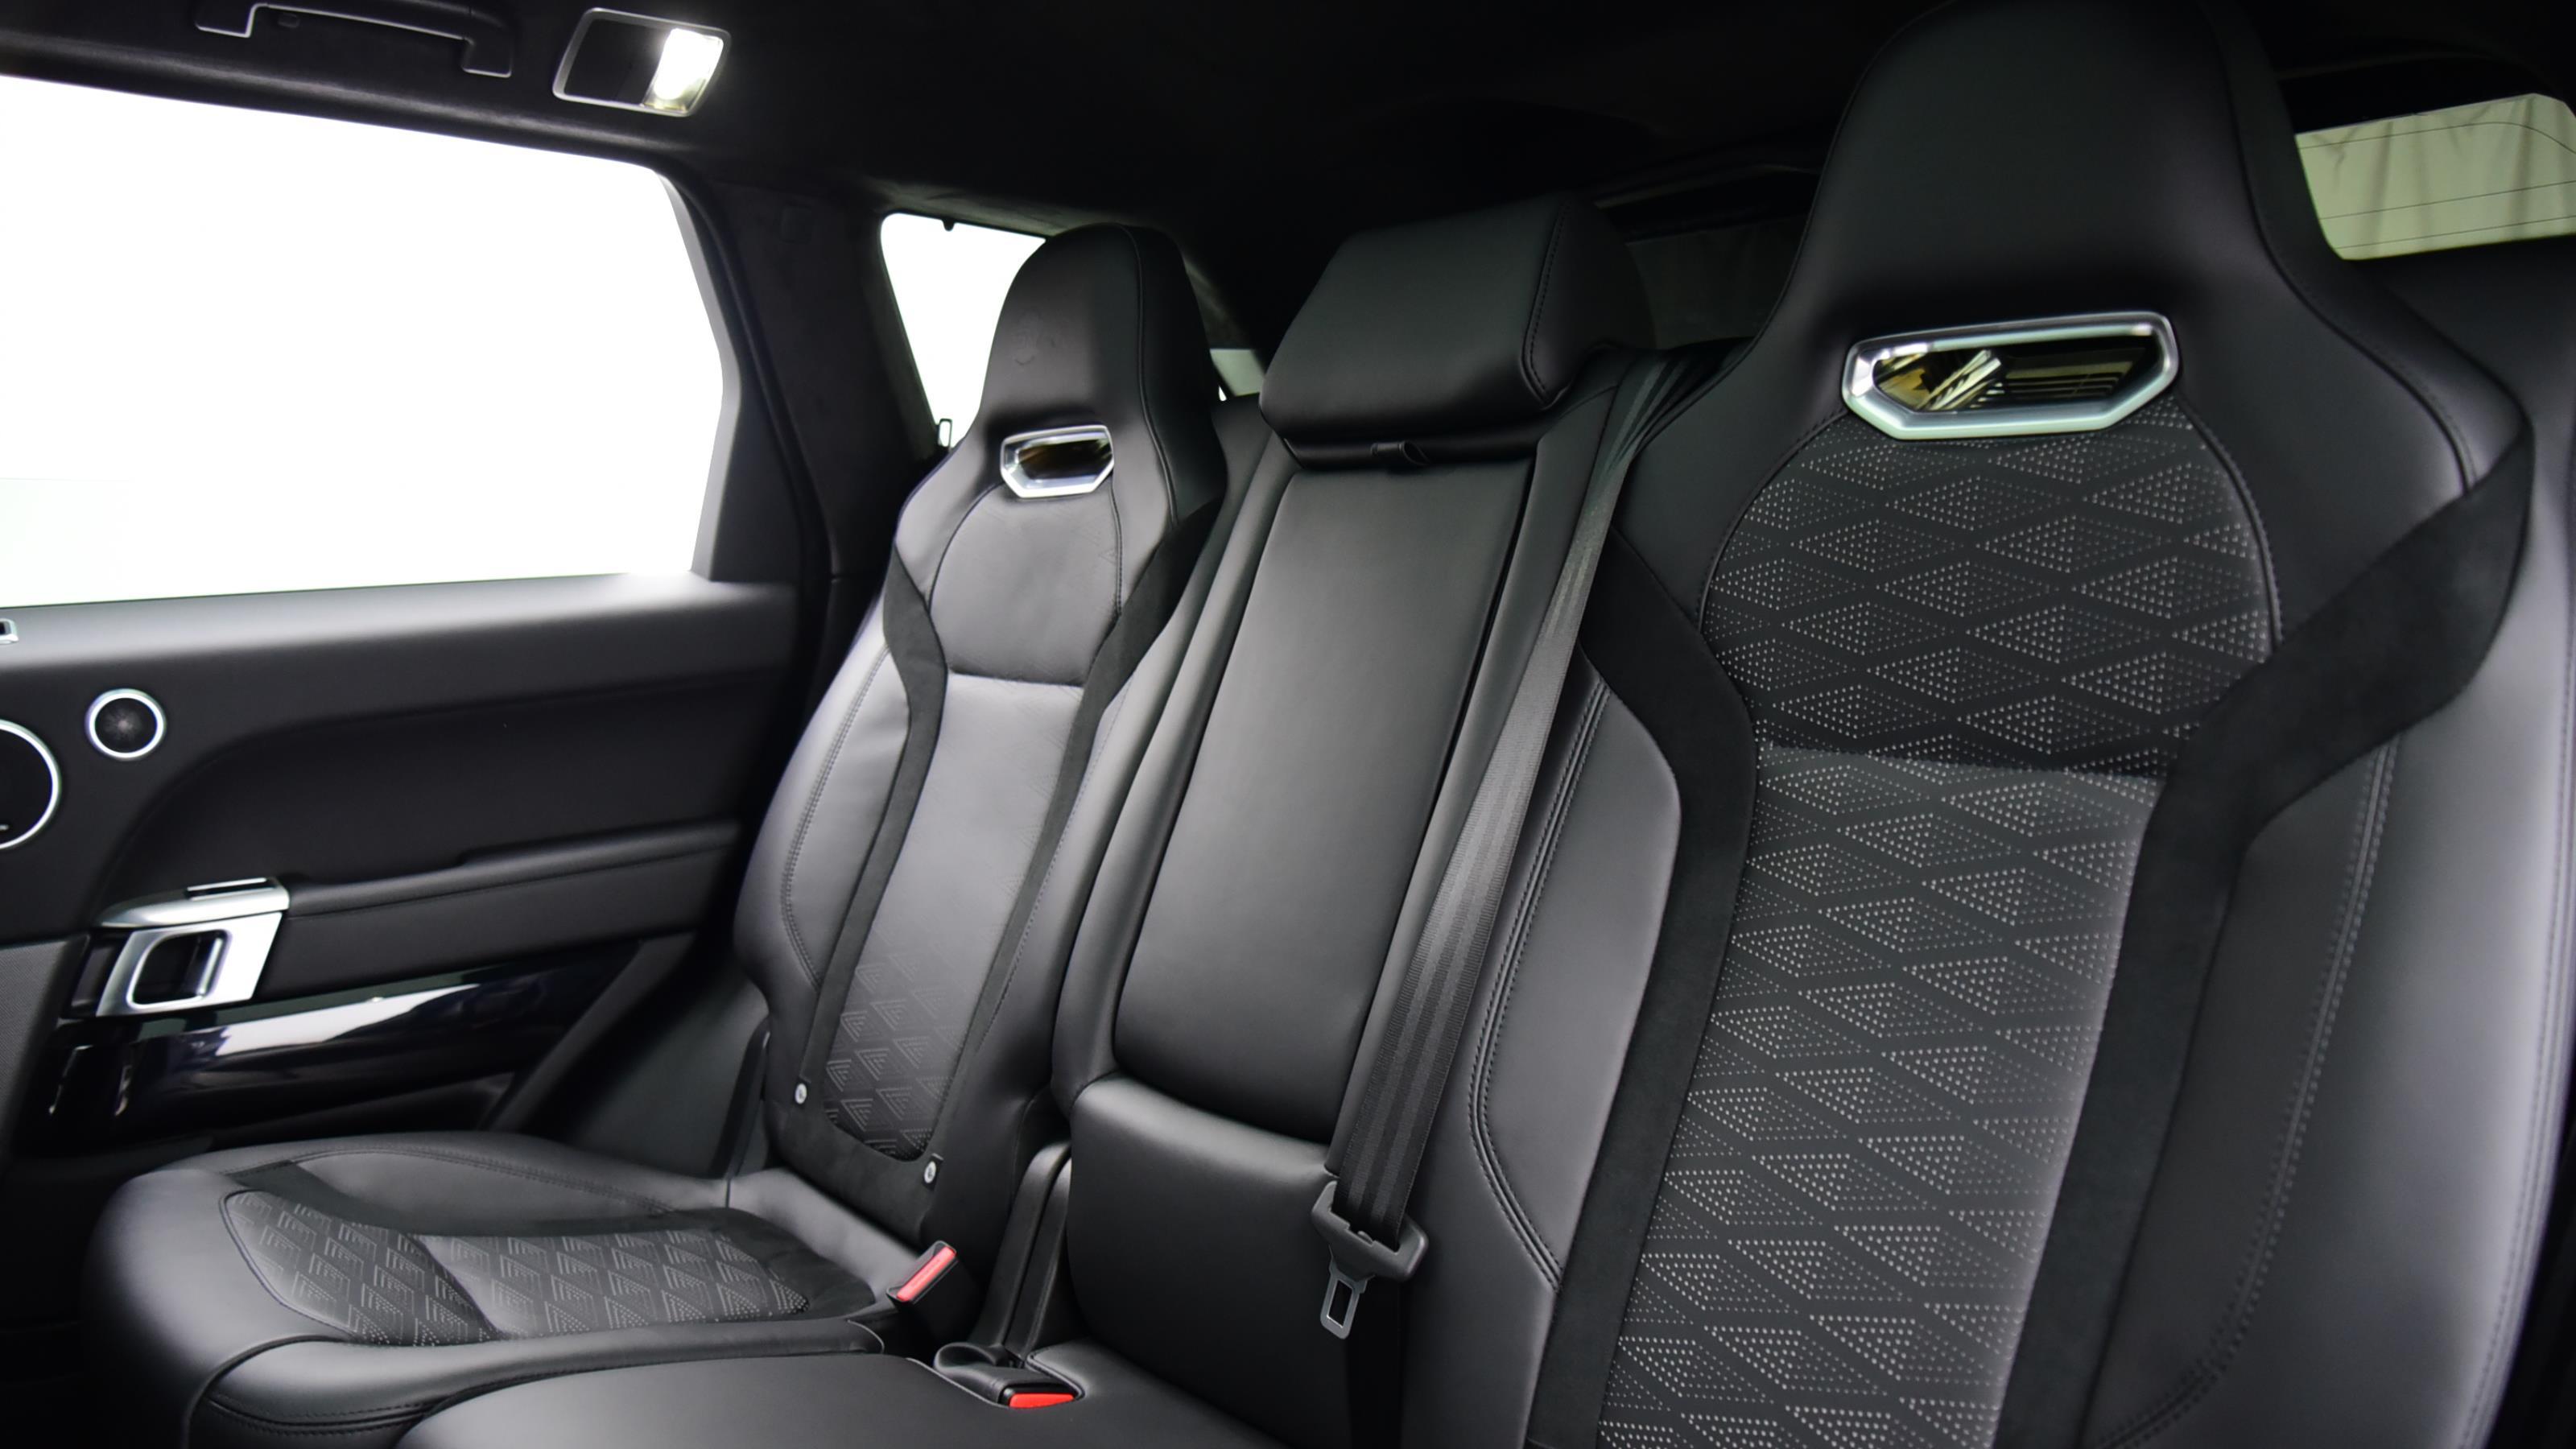 Used 2018 Land Rover RANGE ROVER SPORT 5.0 V8 S/C 575 SVR 5dr Auto          at Saxton4x4